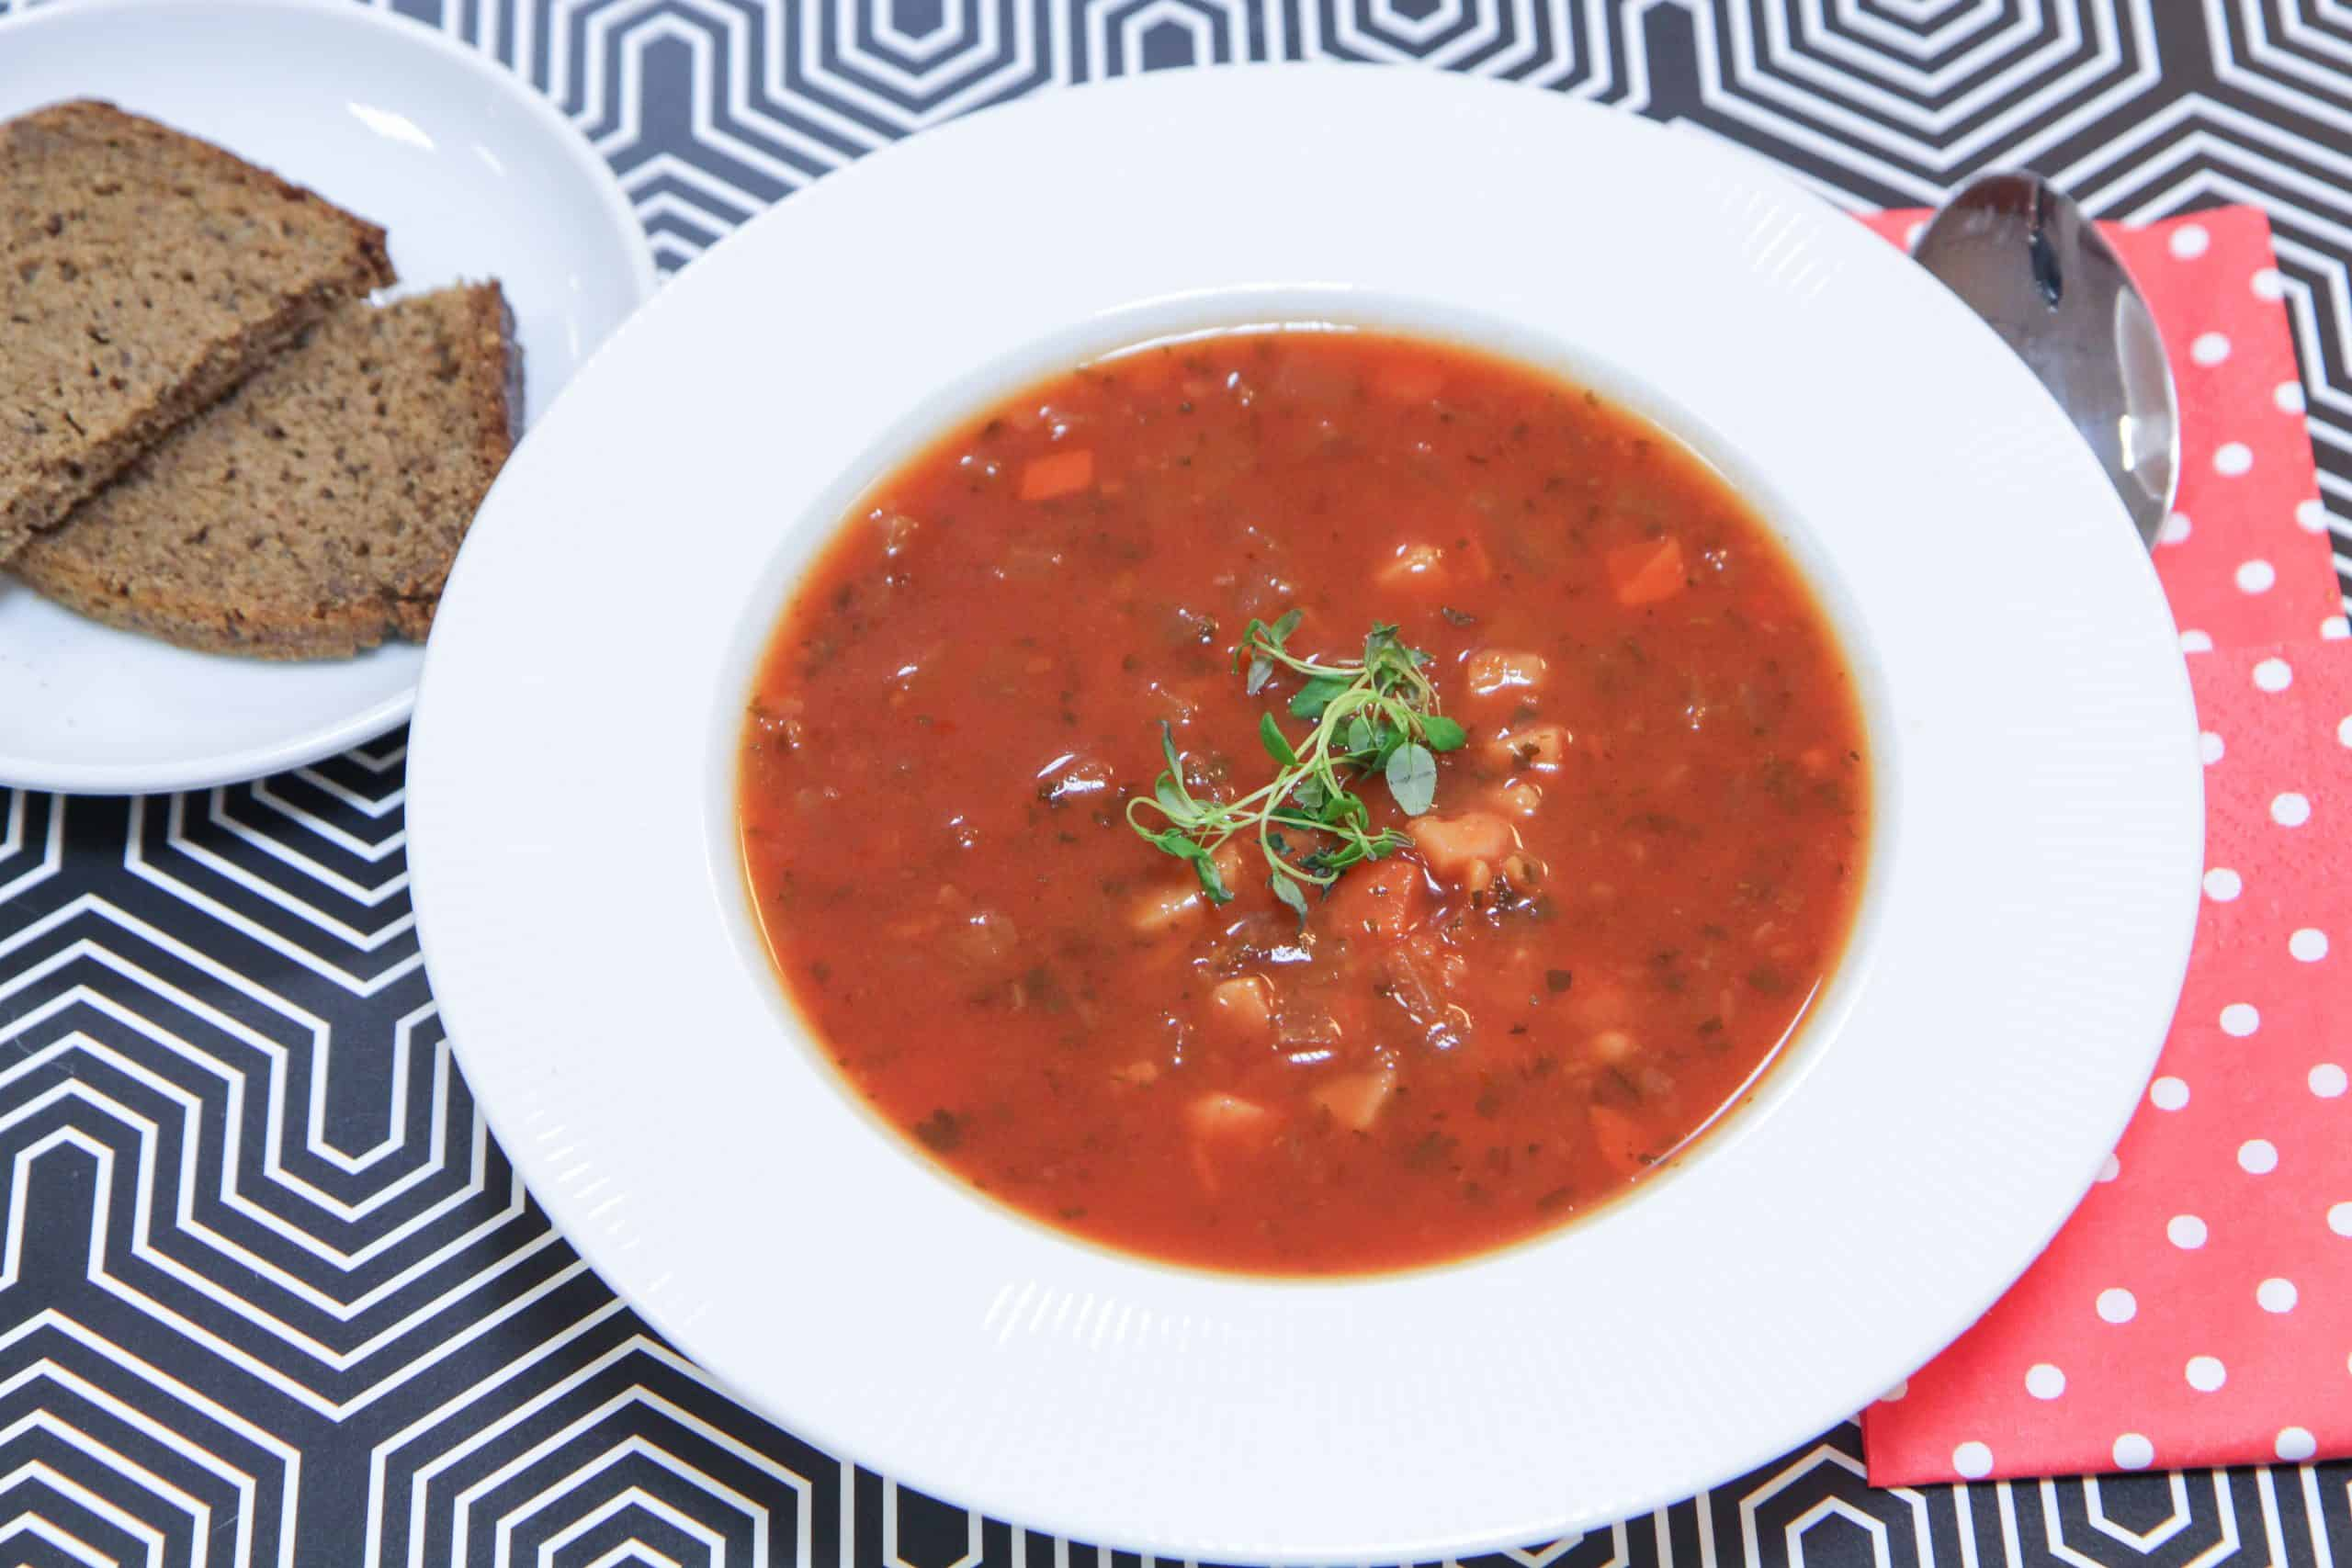 Burokeliu sriuba1